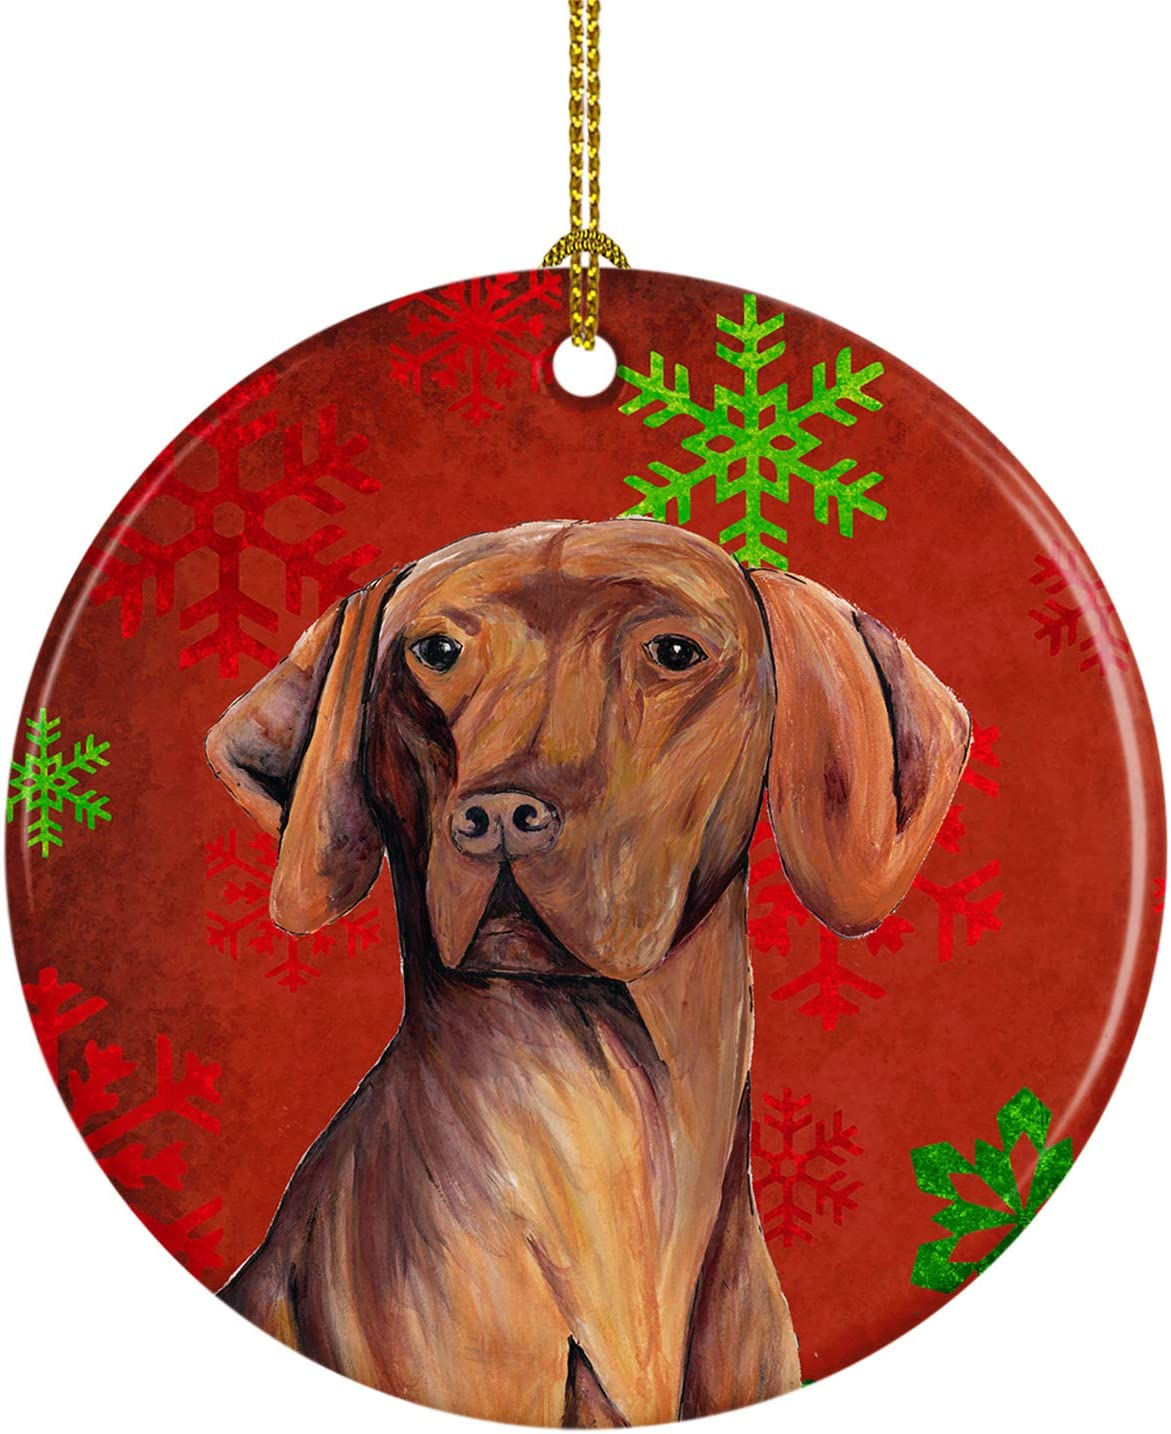 Carolines Treasures LH9235-CO1 Vizsla Candy Cane Holiday Christmas Ceramic Ornament LH9235 Multicolor 3 in